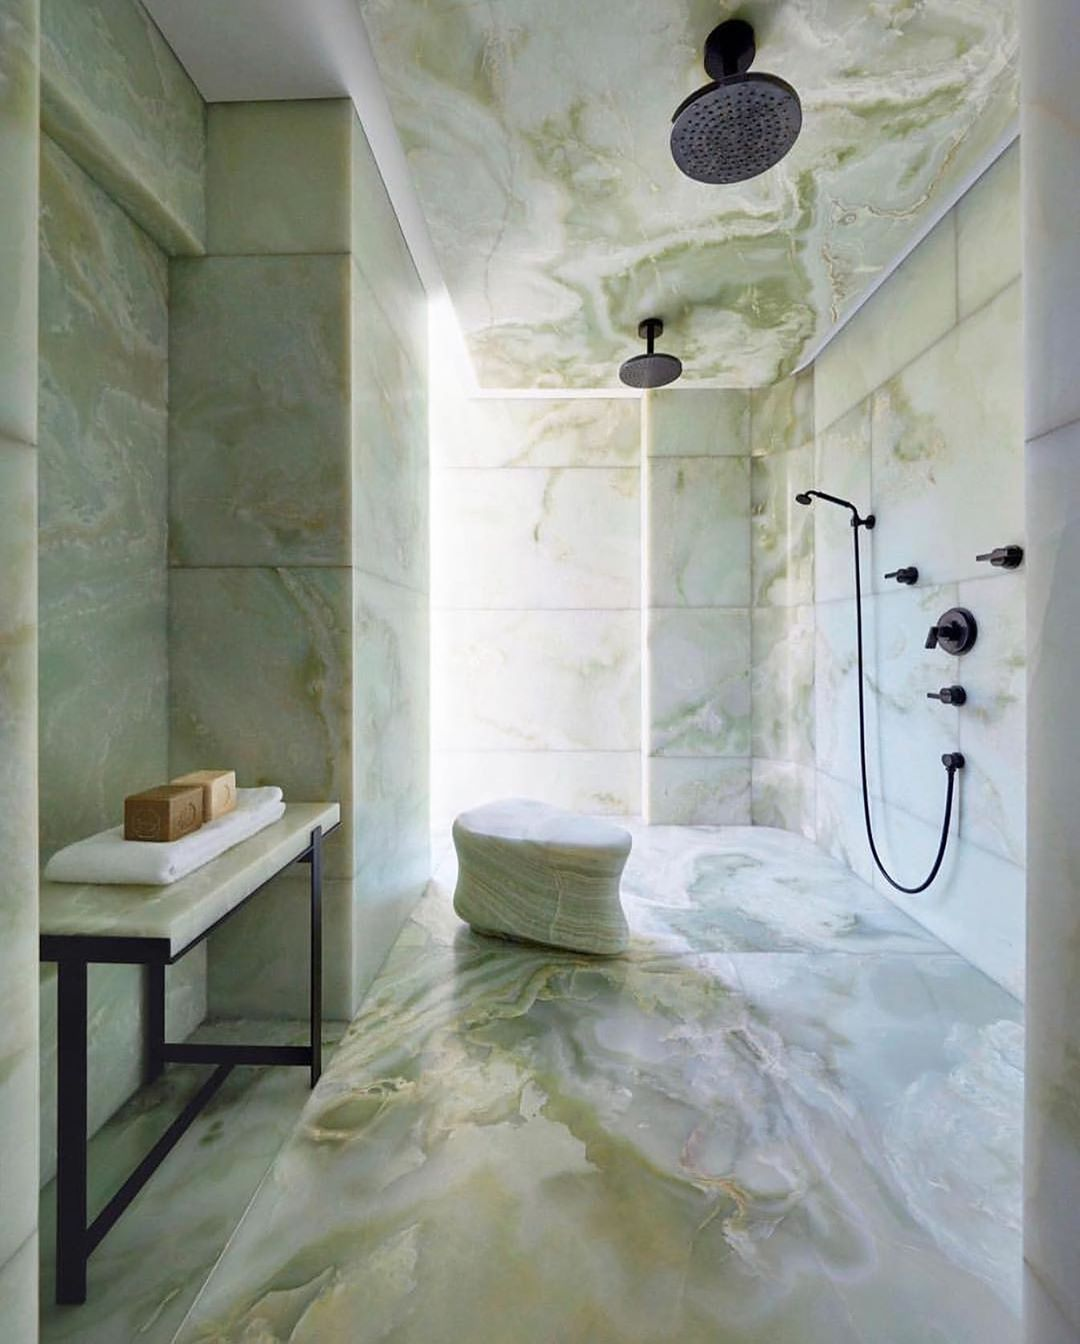 Green Onyx Bathroom Of Our Dreams Regram Sophiaroe Via